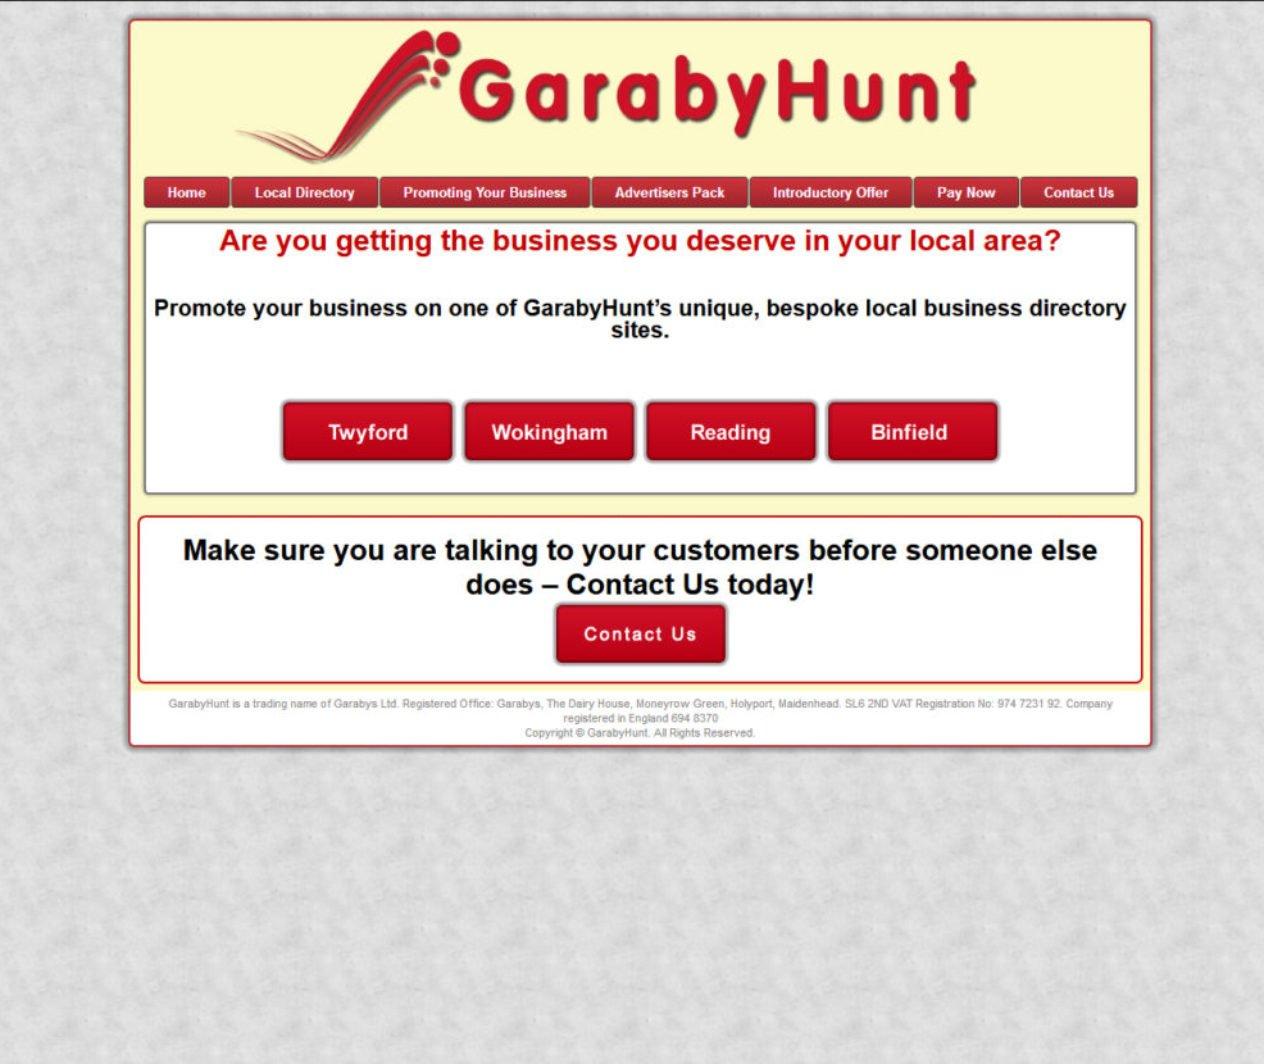 Garaby Hunt